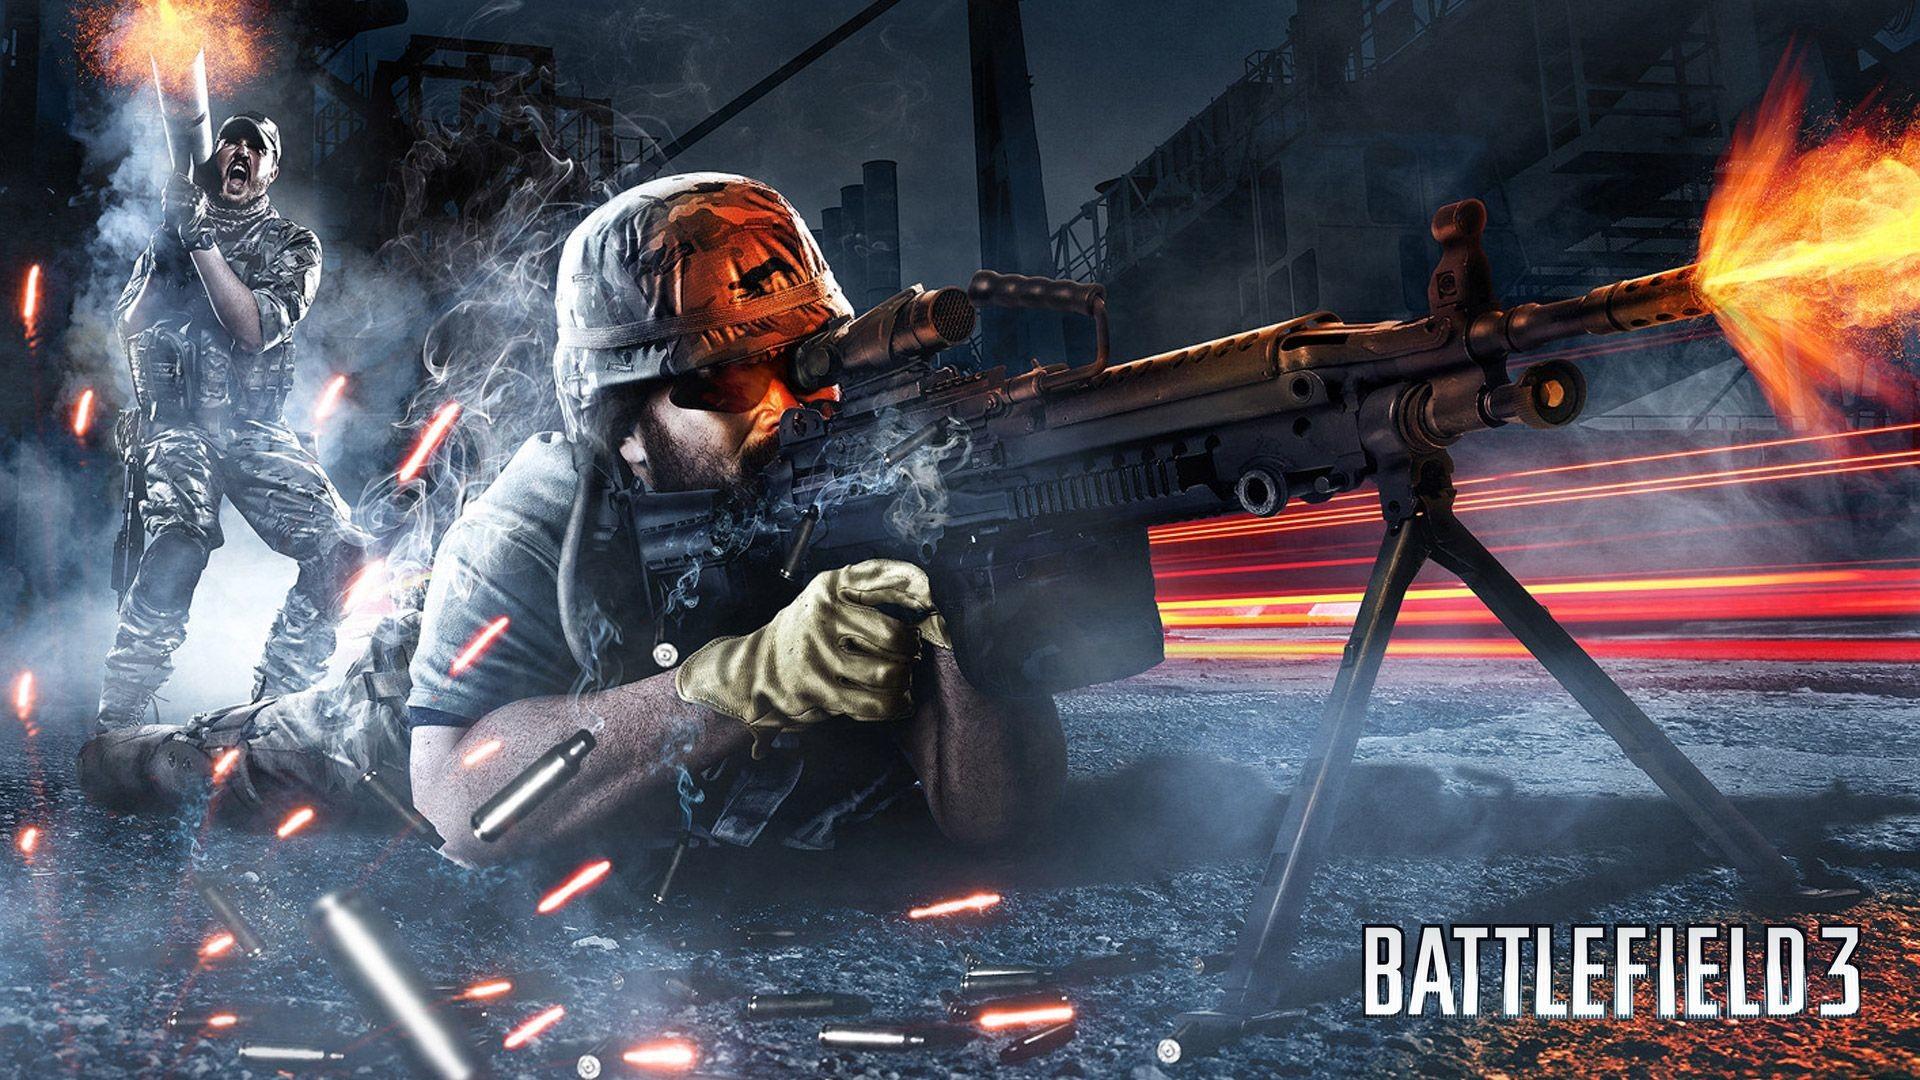 Res: 1920x1080, battlefield | Download Battlefield 3 wallpaper 293109